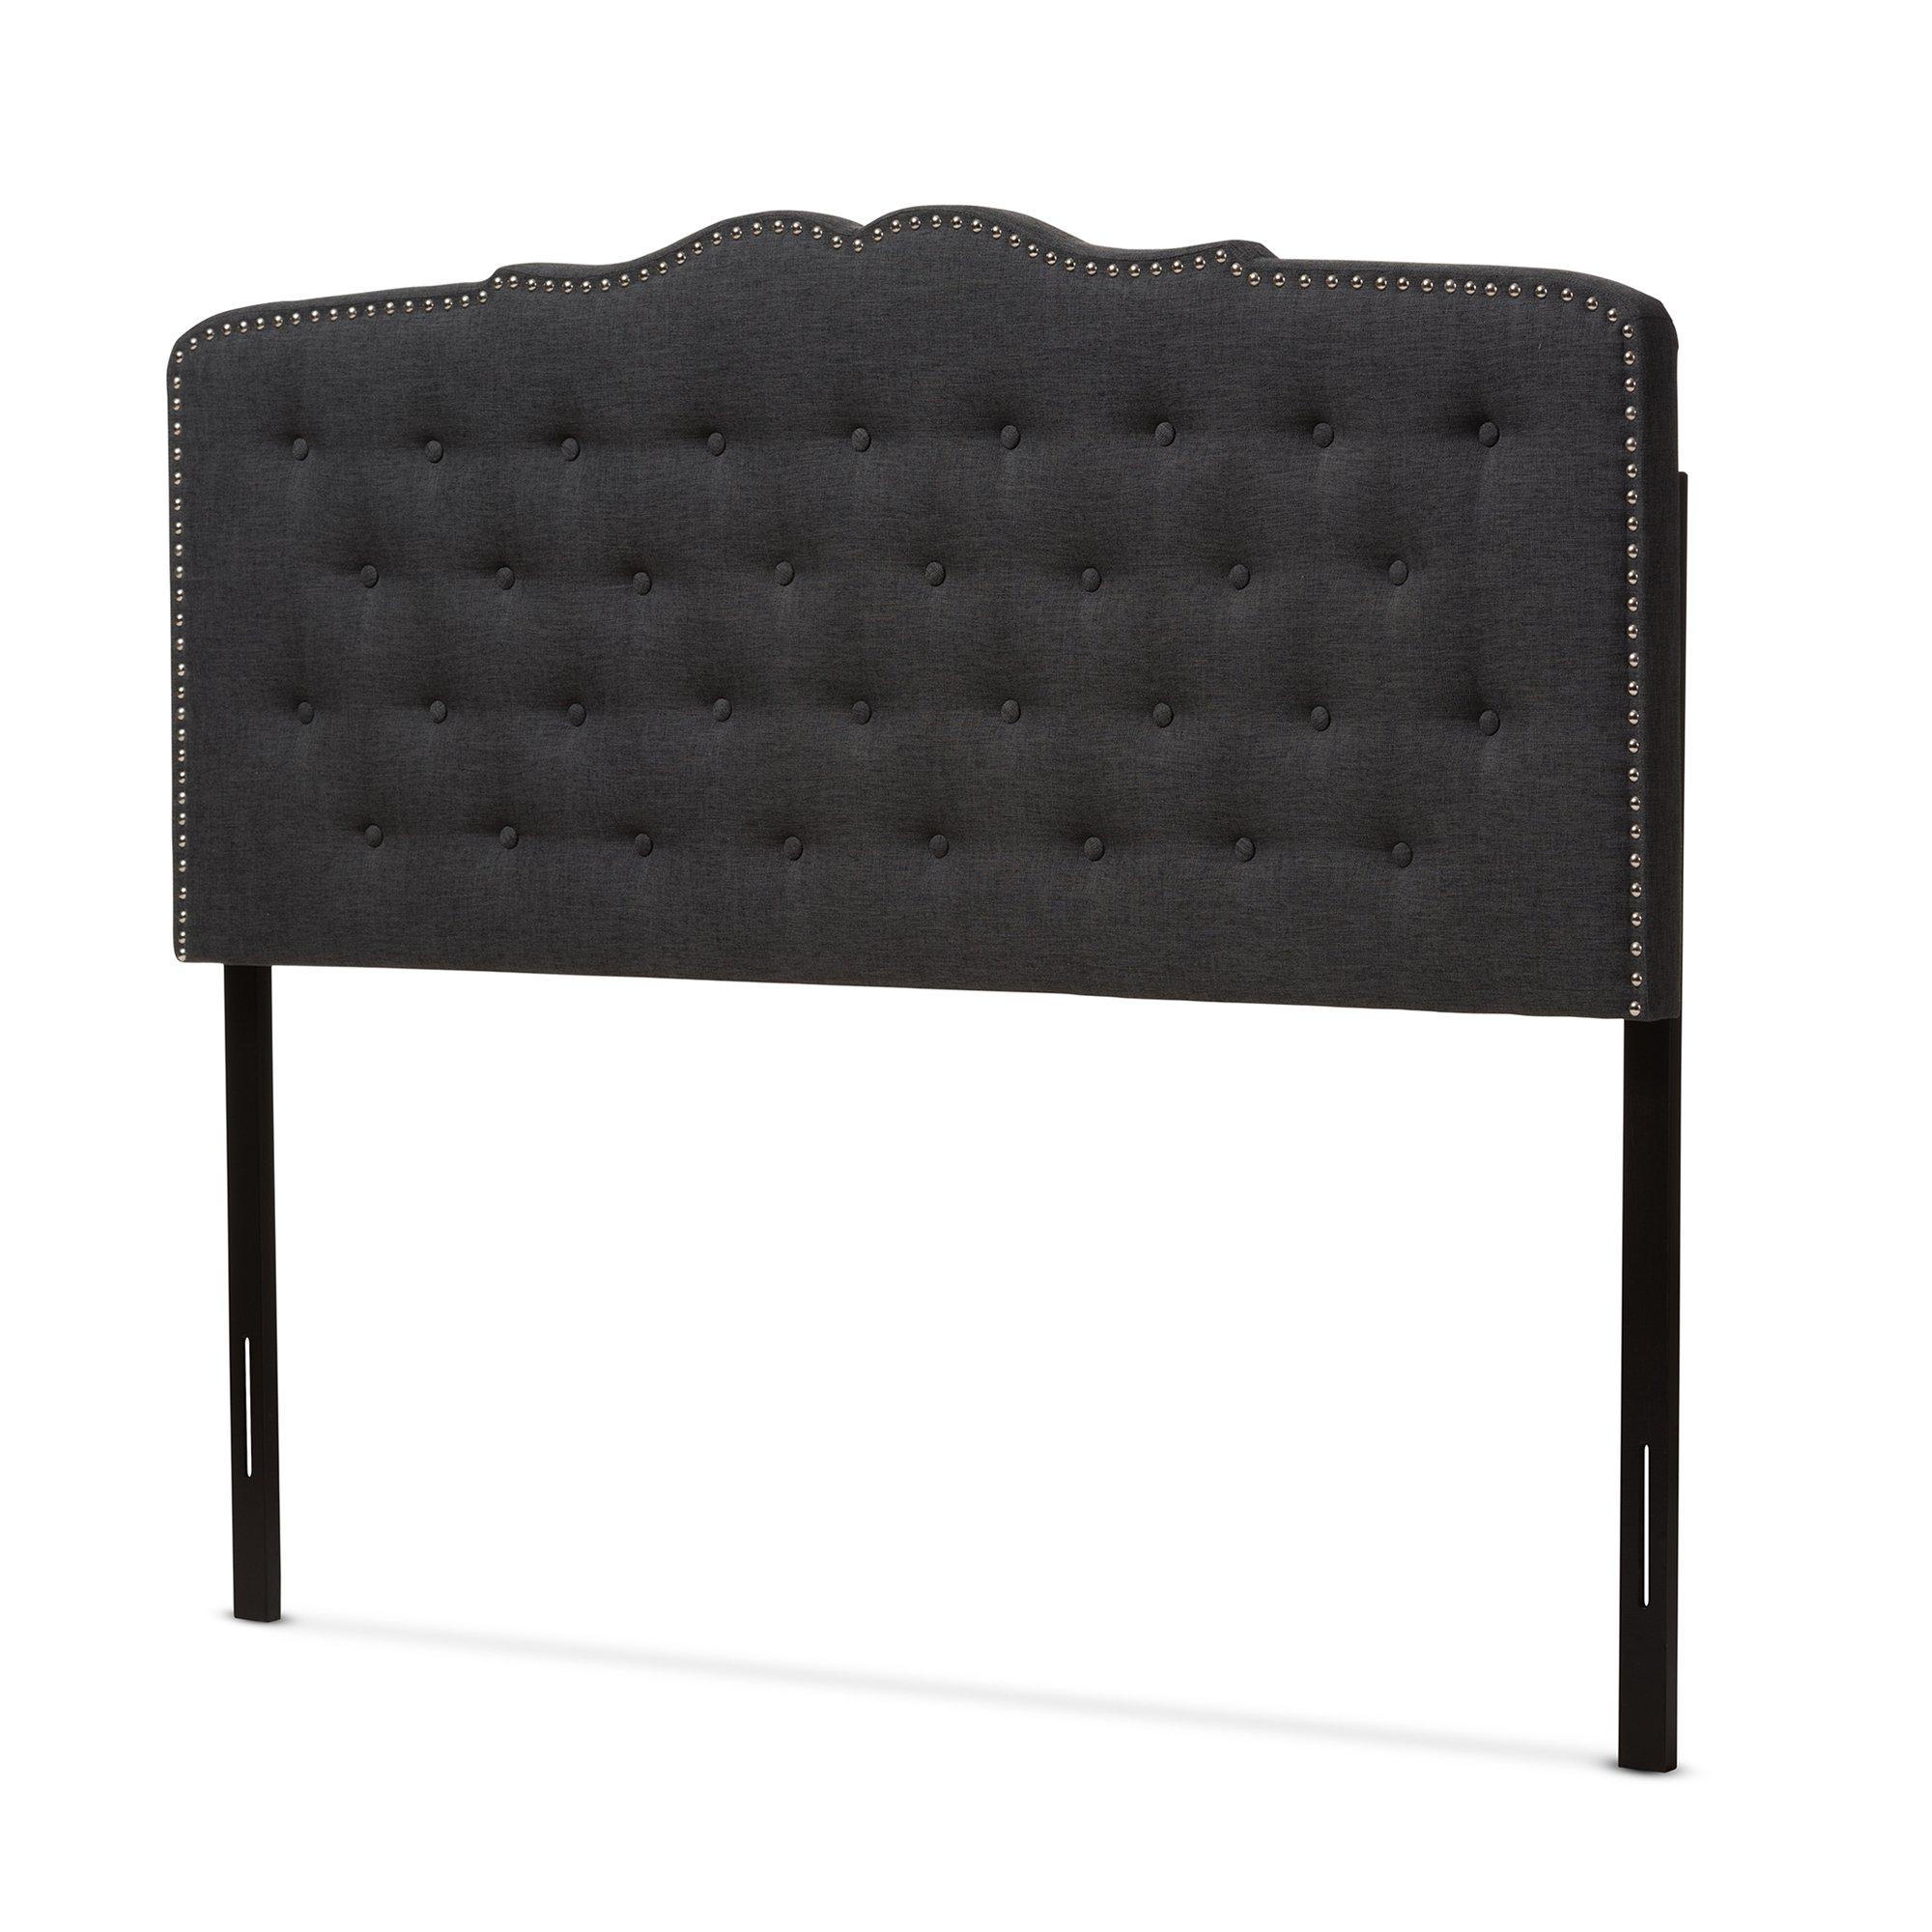 Baxton Studio Karessa Modern & Contemporary Dark Grey Fabric King Size Headboard by Baxton Studio